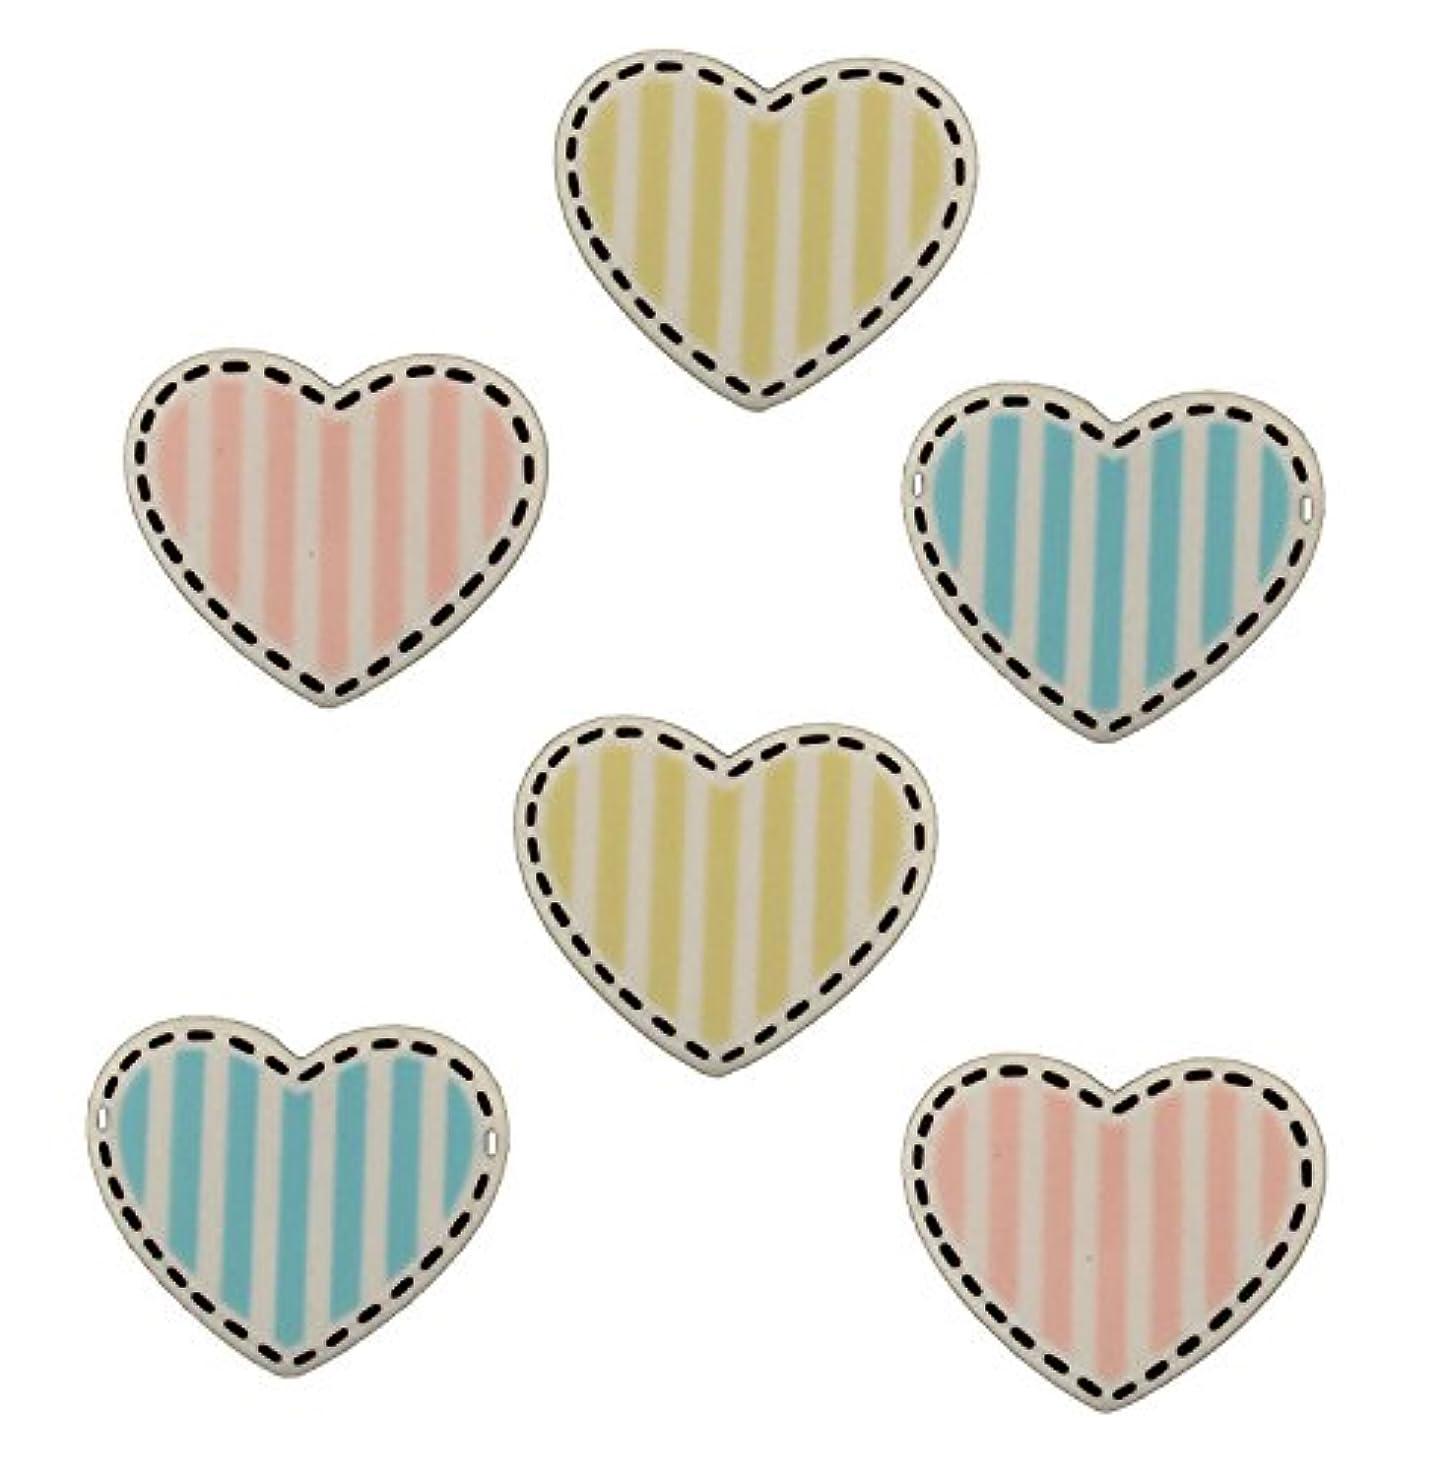 BaZooples Buttons-Heart Medley